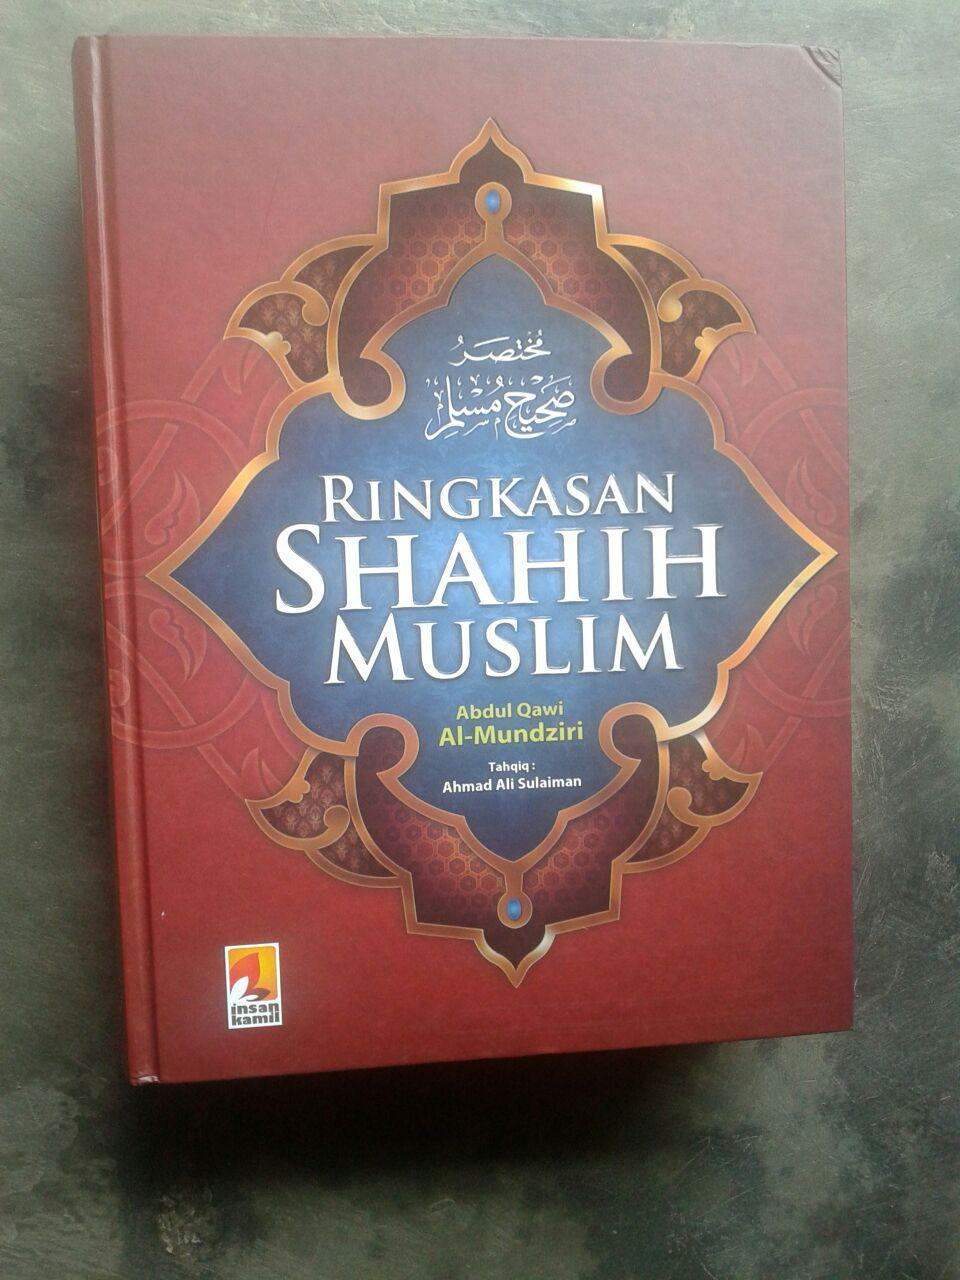 Buku Ringkasan Shahih Muslim cover